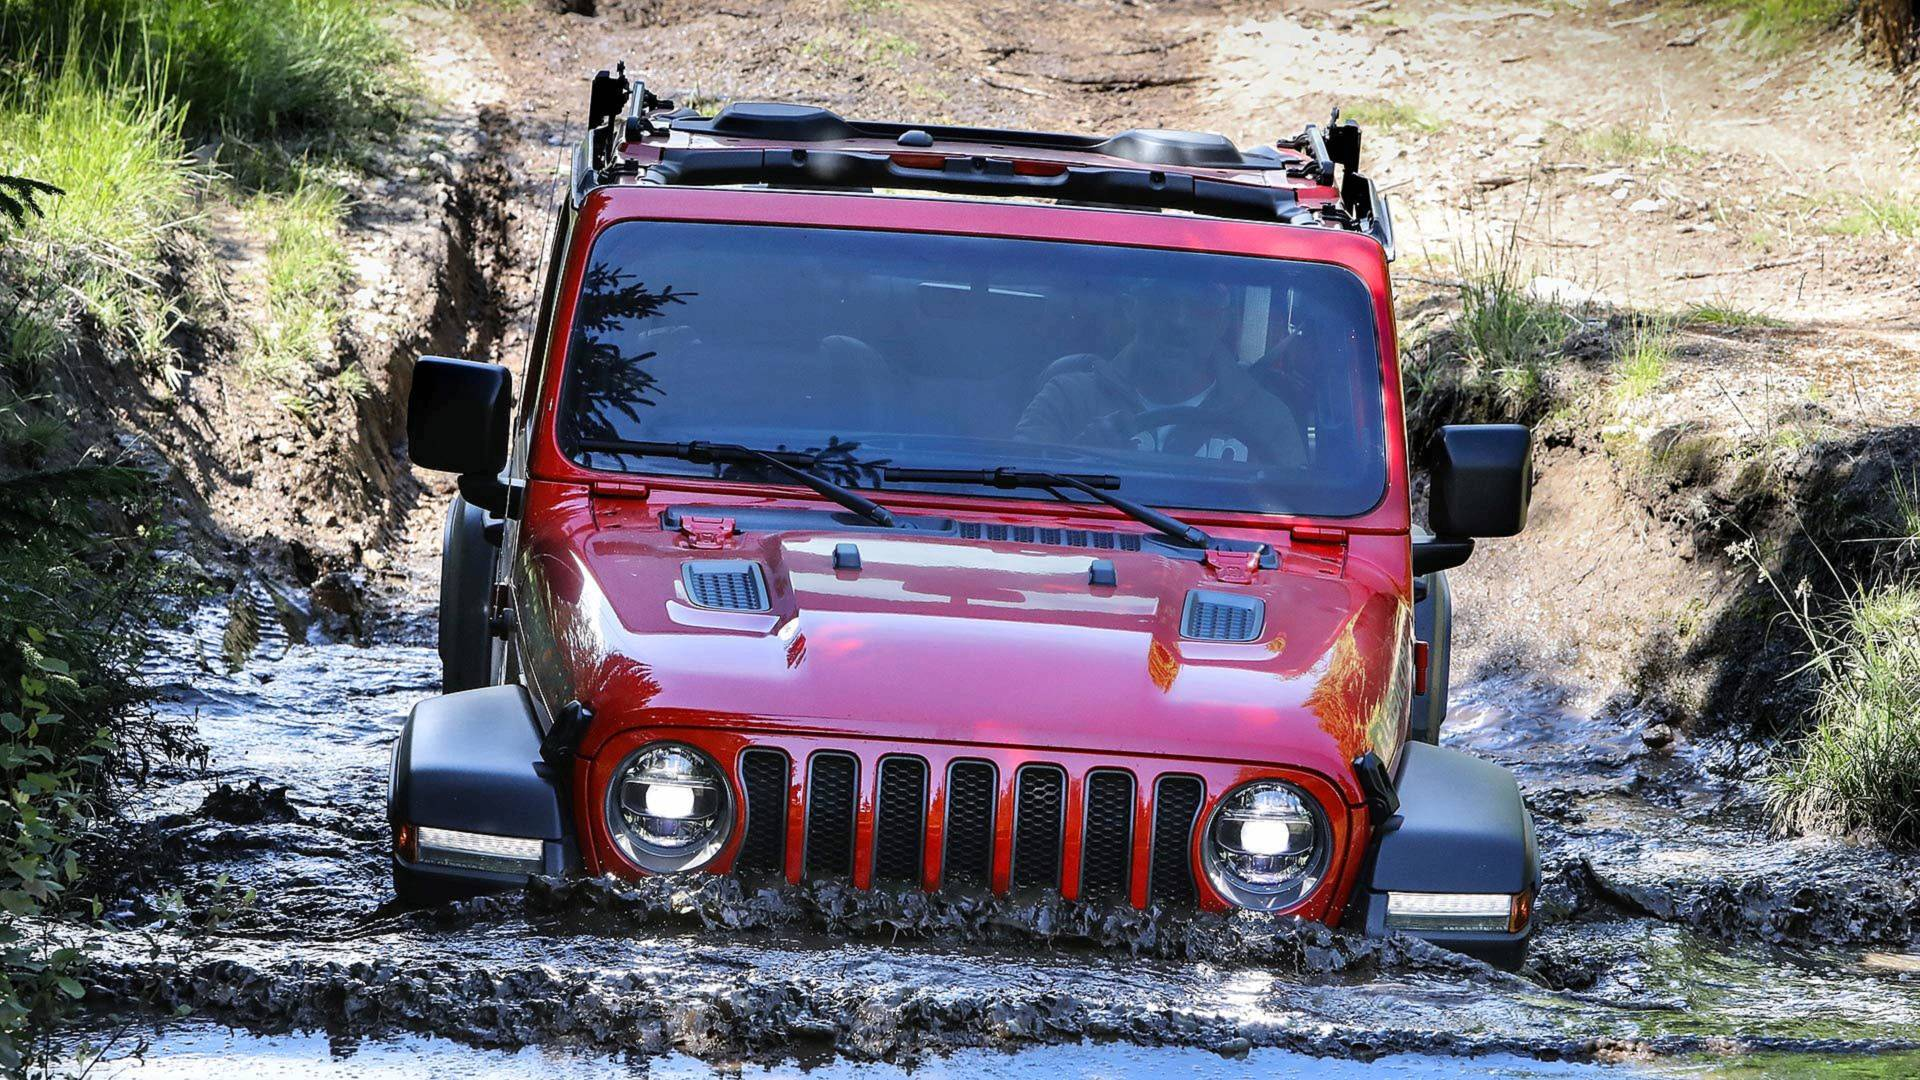 jl-jeep-wramngler-european-specification